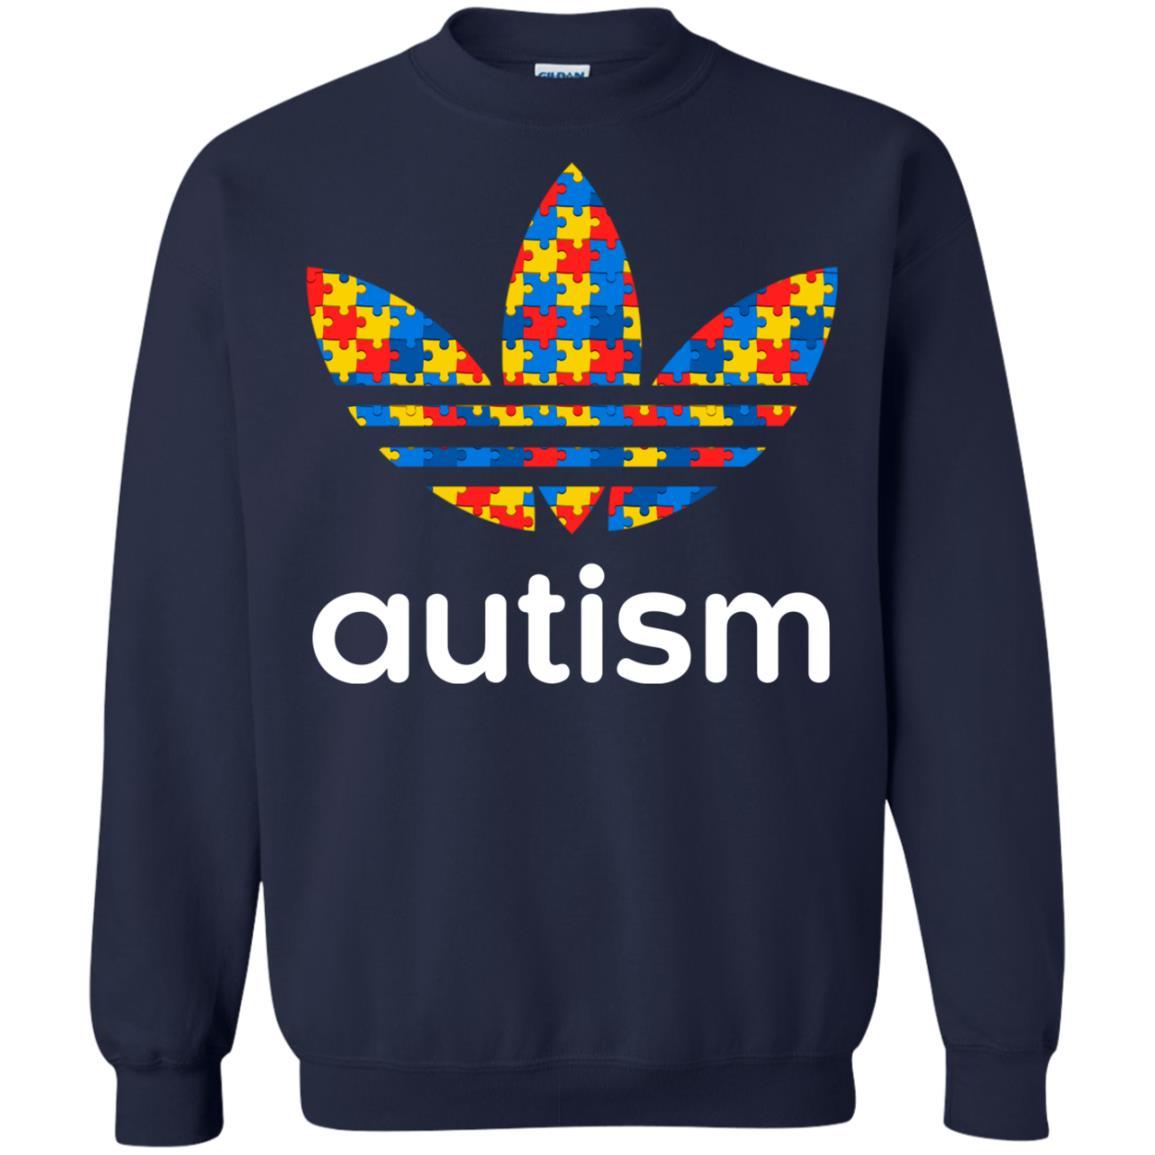 Autism Adidas T Shirt Hoodie Sweater Long Sleeve [ 1155 x 1155 Pixel ]